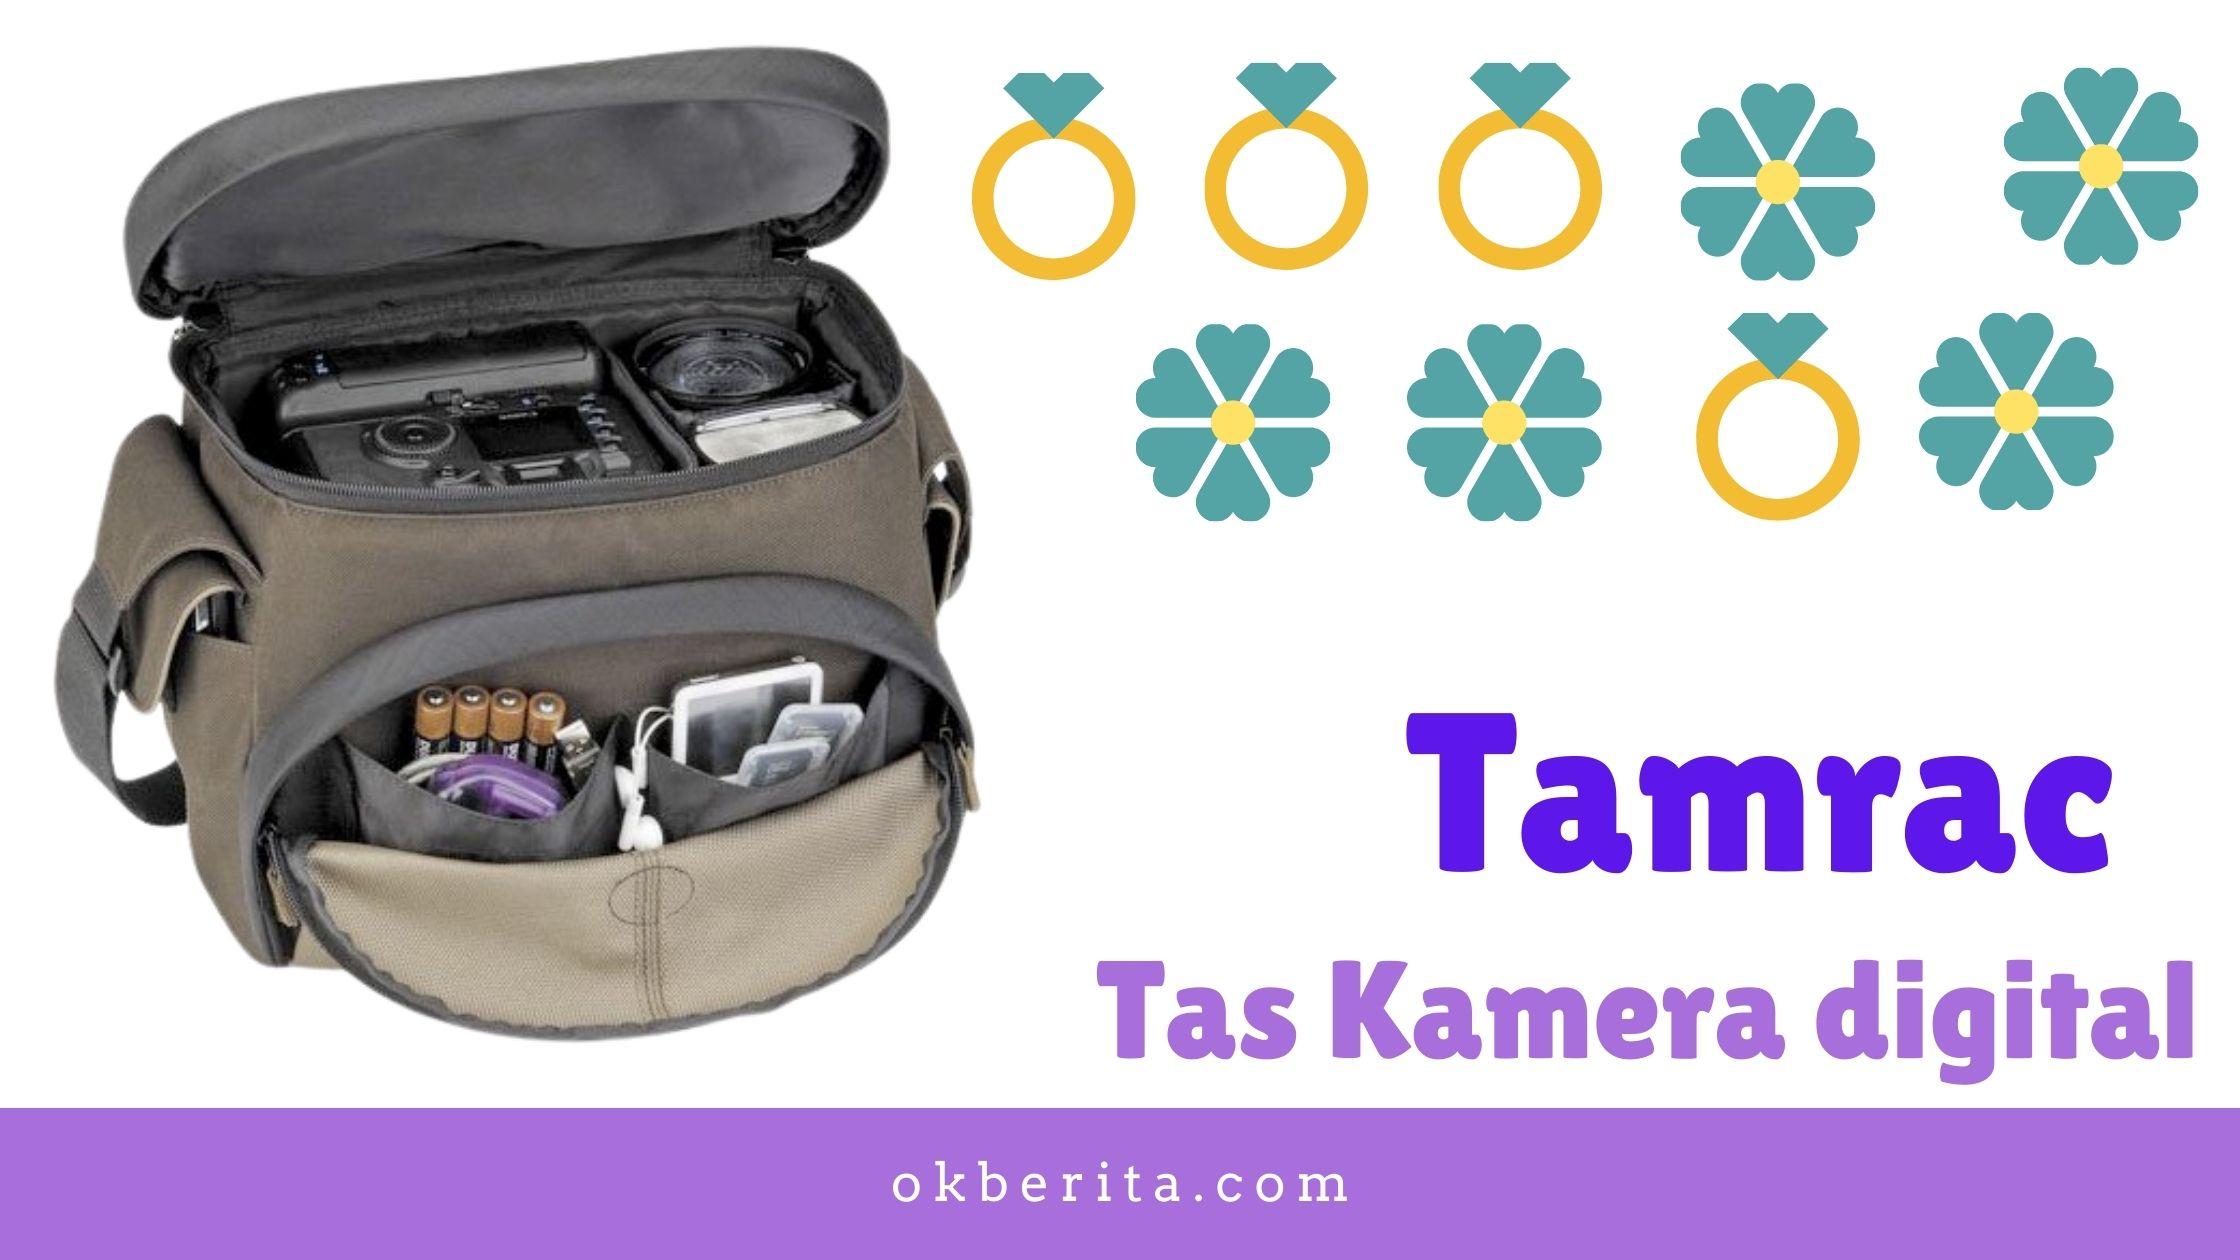 Tamrac Tas Kamera digital